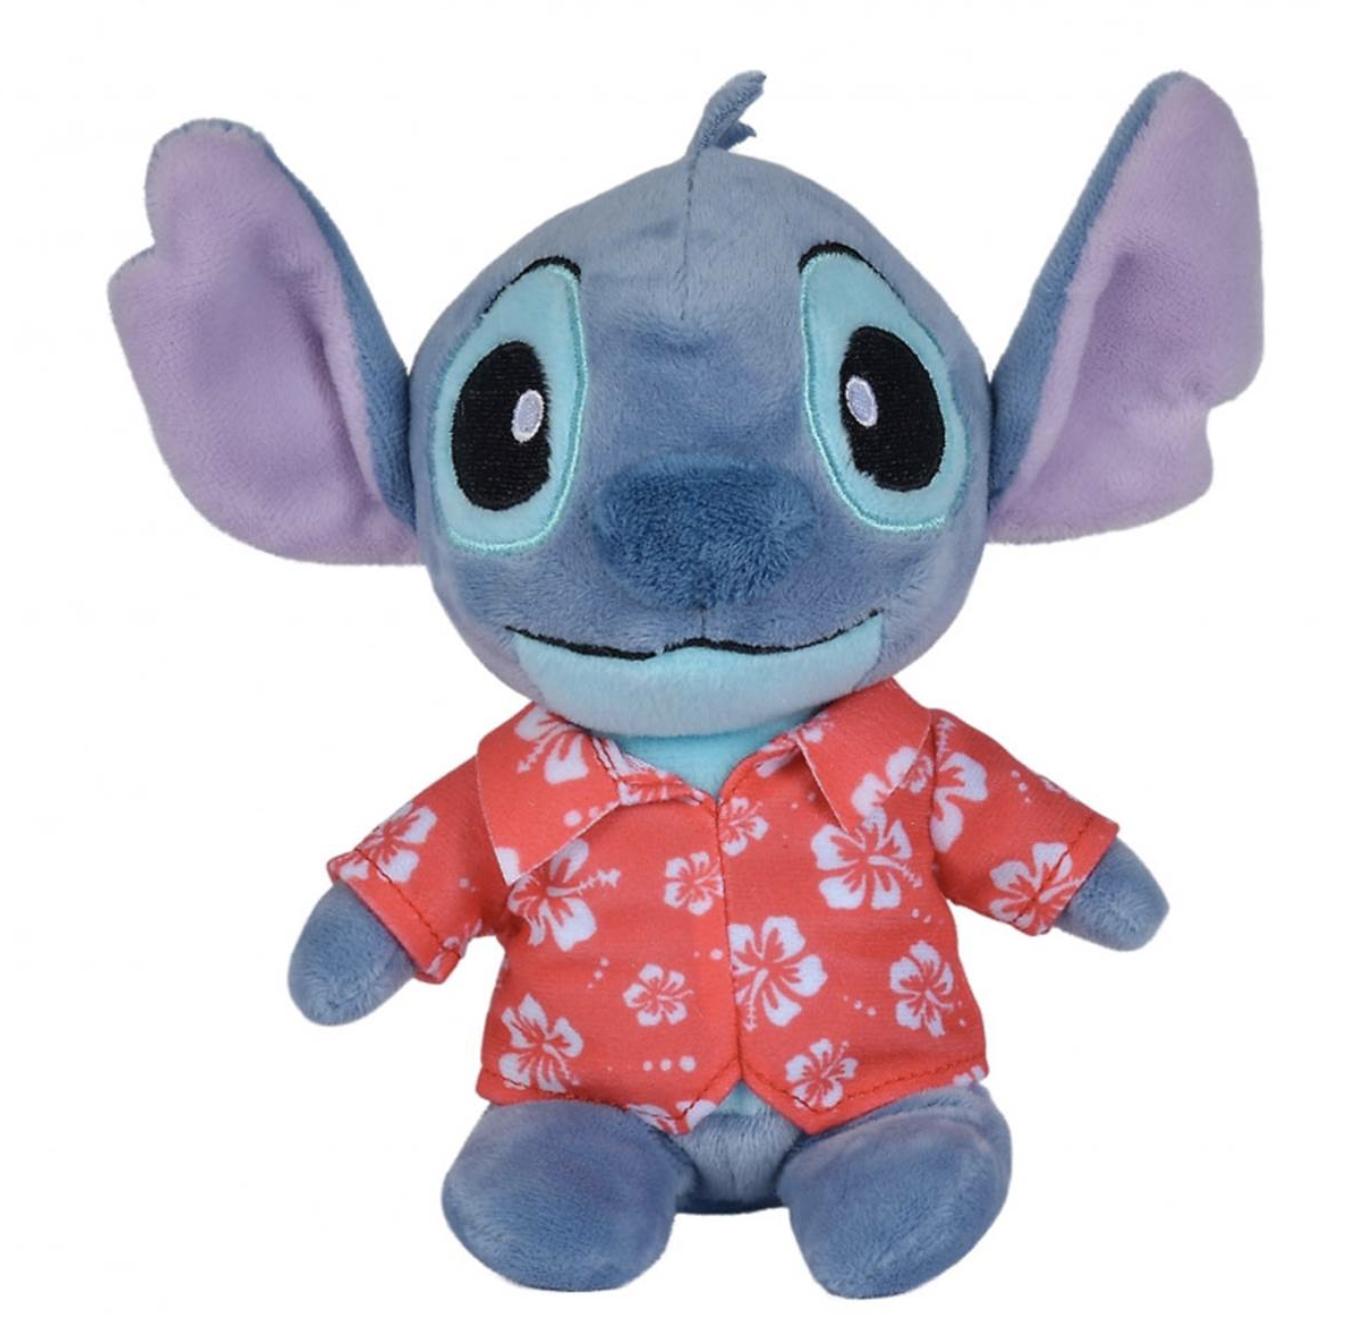 Disney - Lilo et Stitch : Peluche Stitch chemise Hawaii